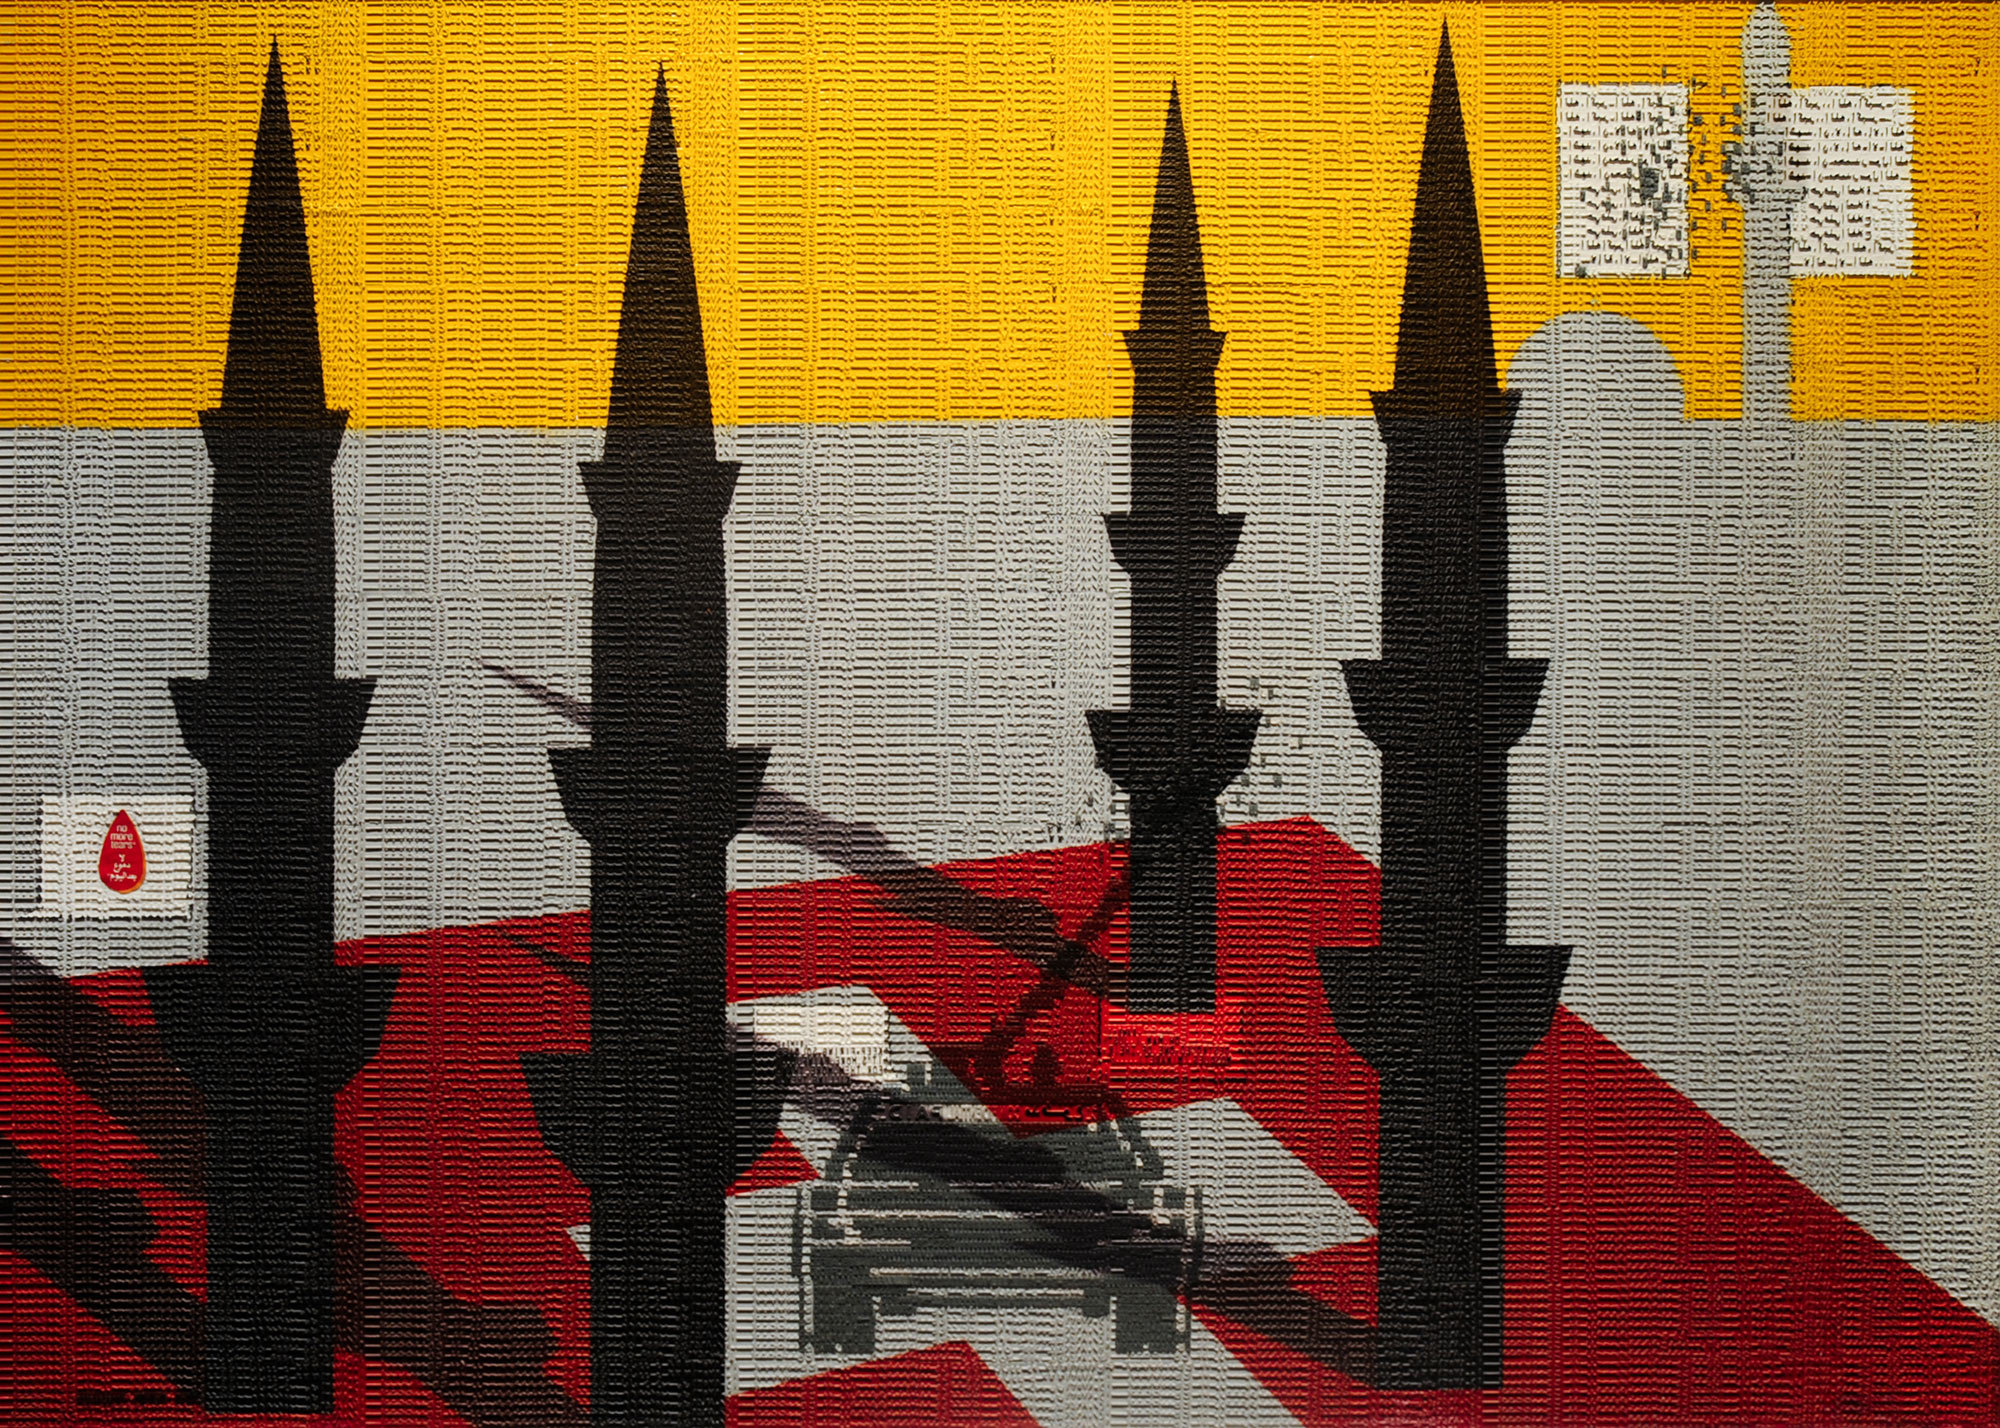 Generation Kill | Abdulnasser Gharem